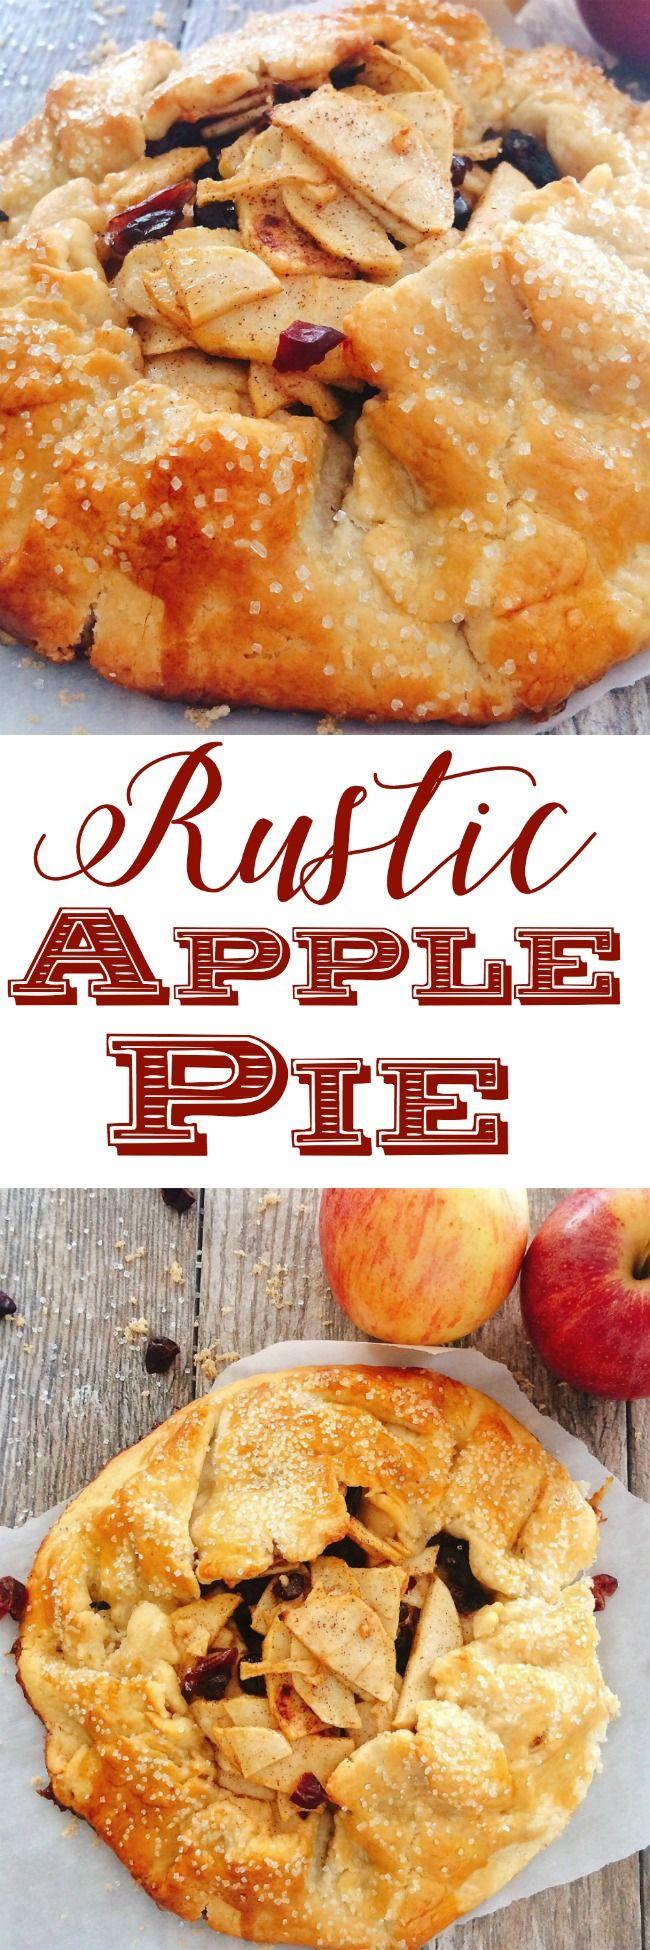 Easy Rustic Apple Pie